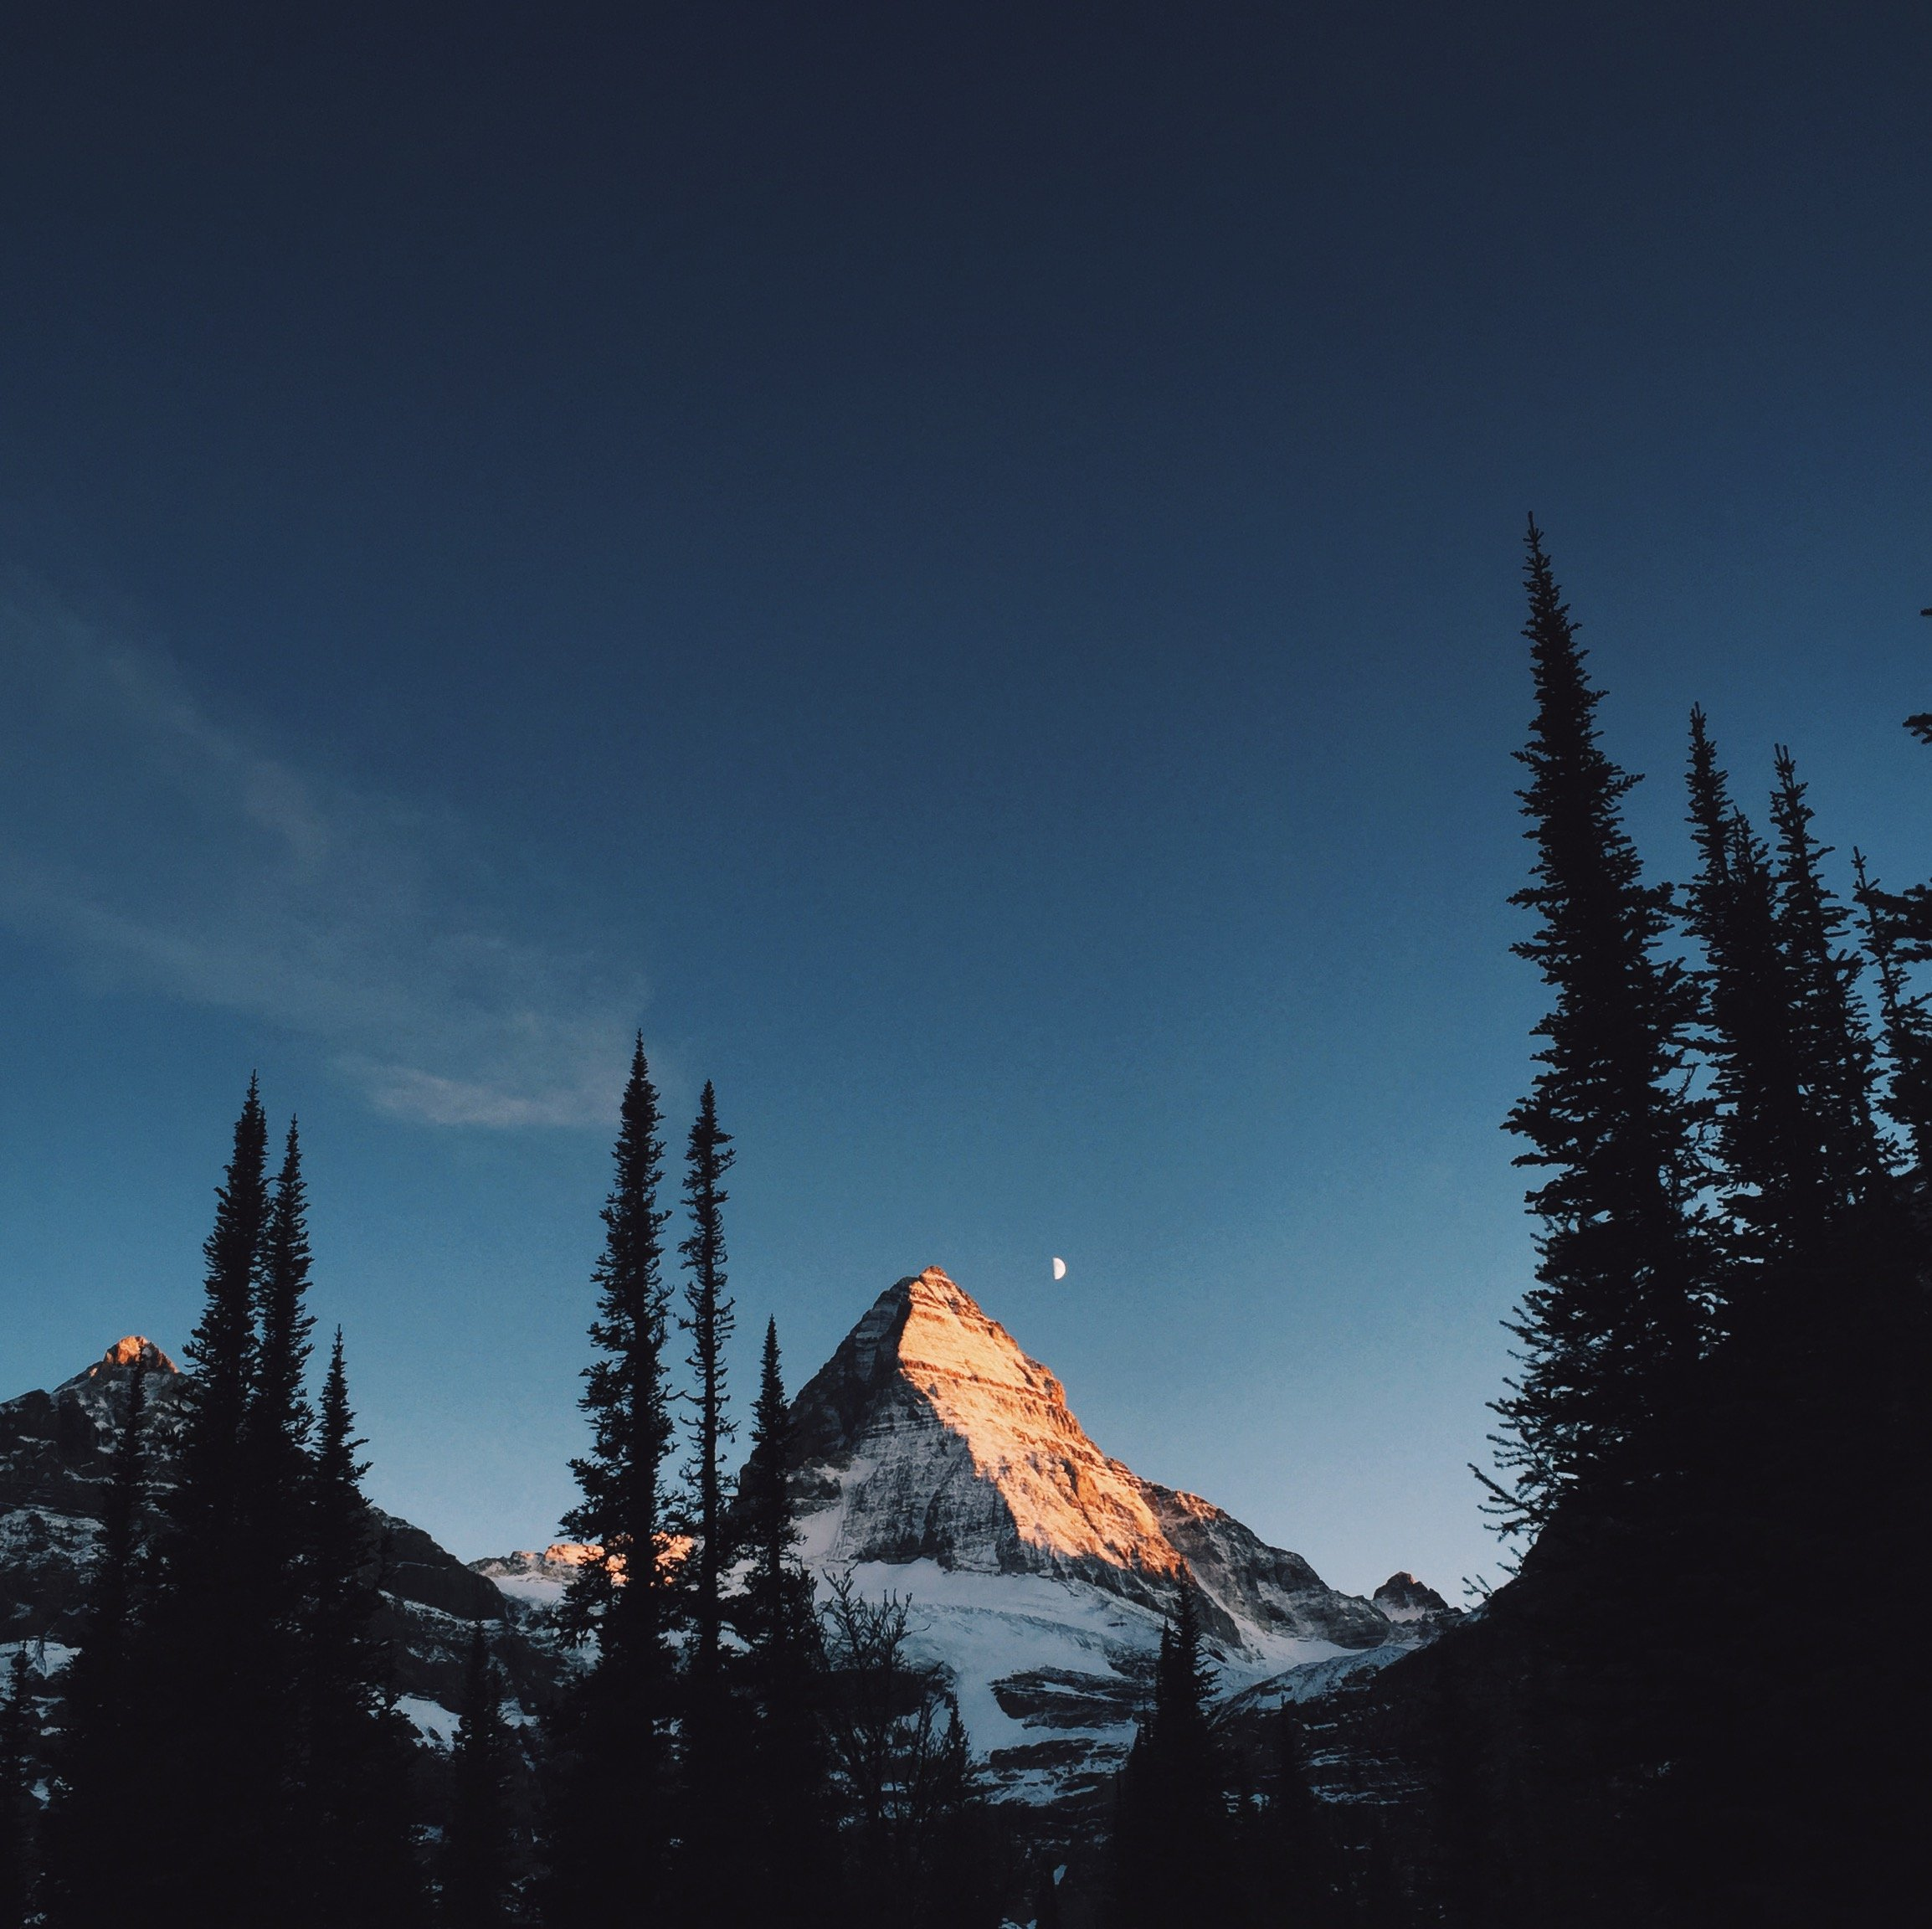 Mount Hd Wallpaper: Alpenglow On Mount Assiniboine BC HD Wallpaper